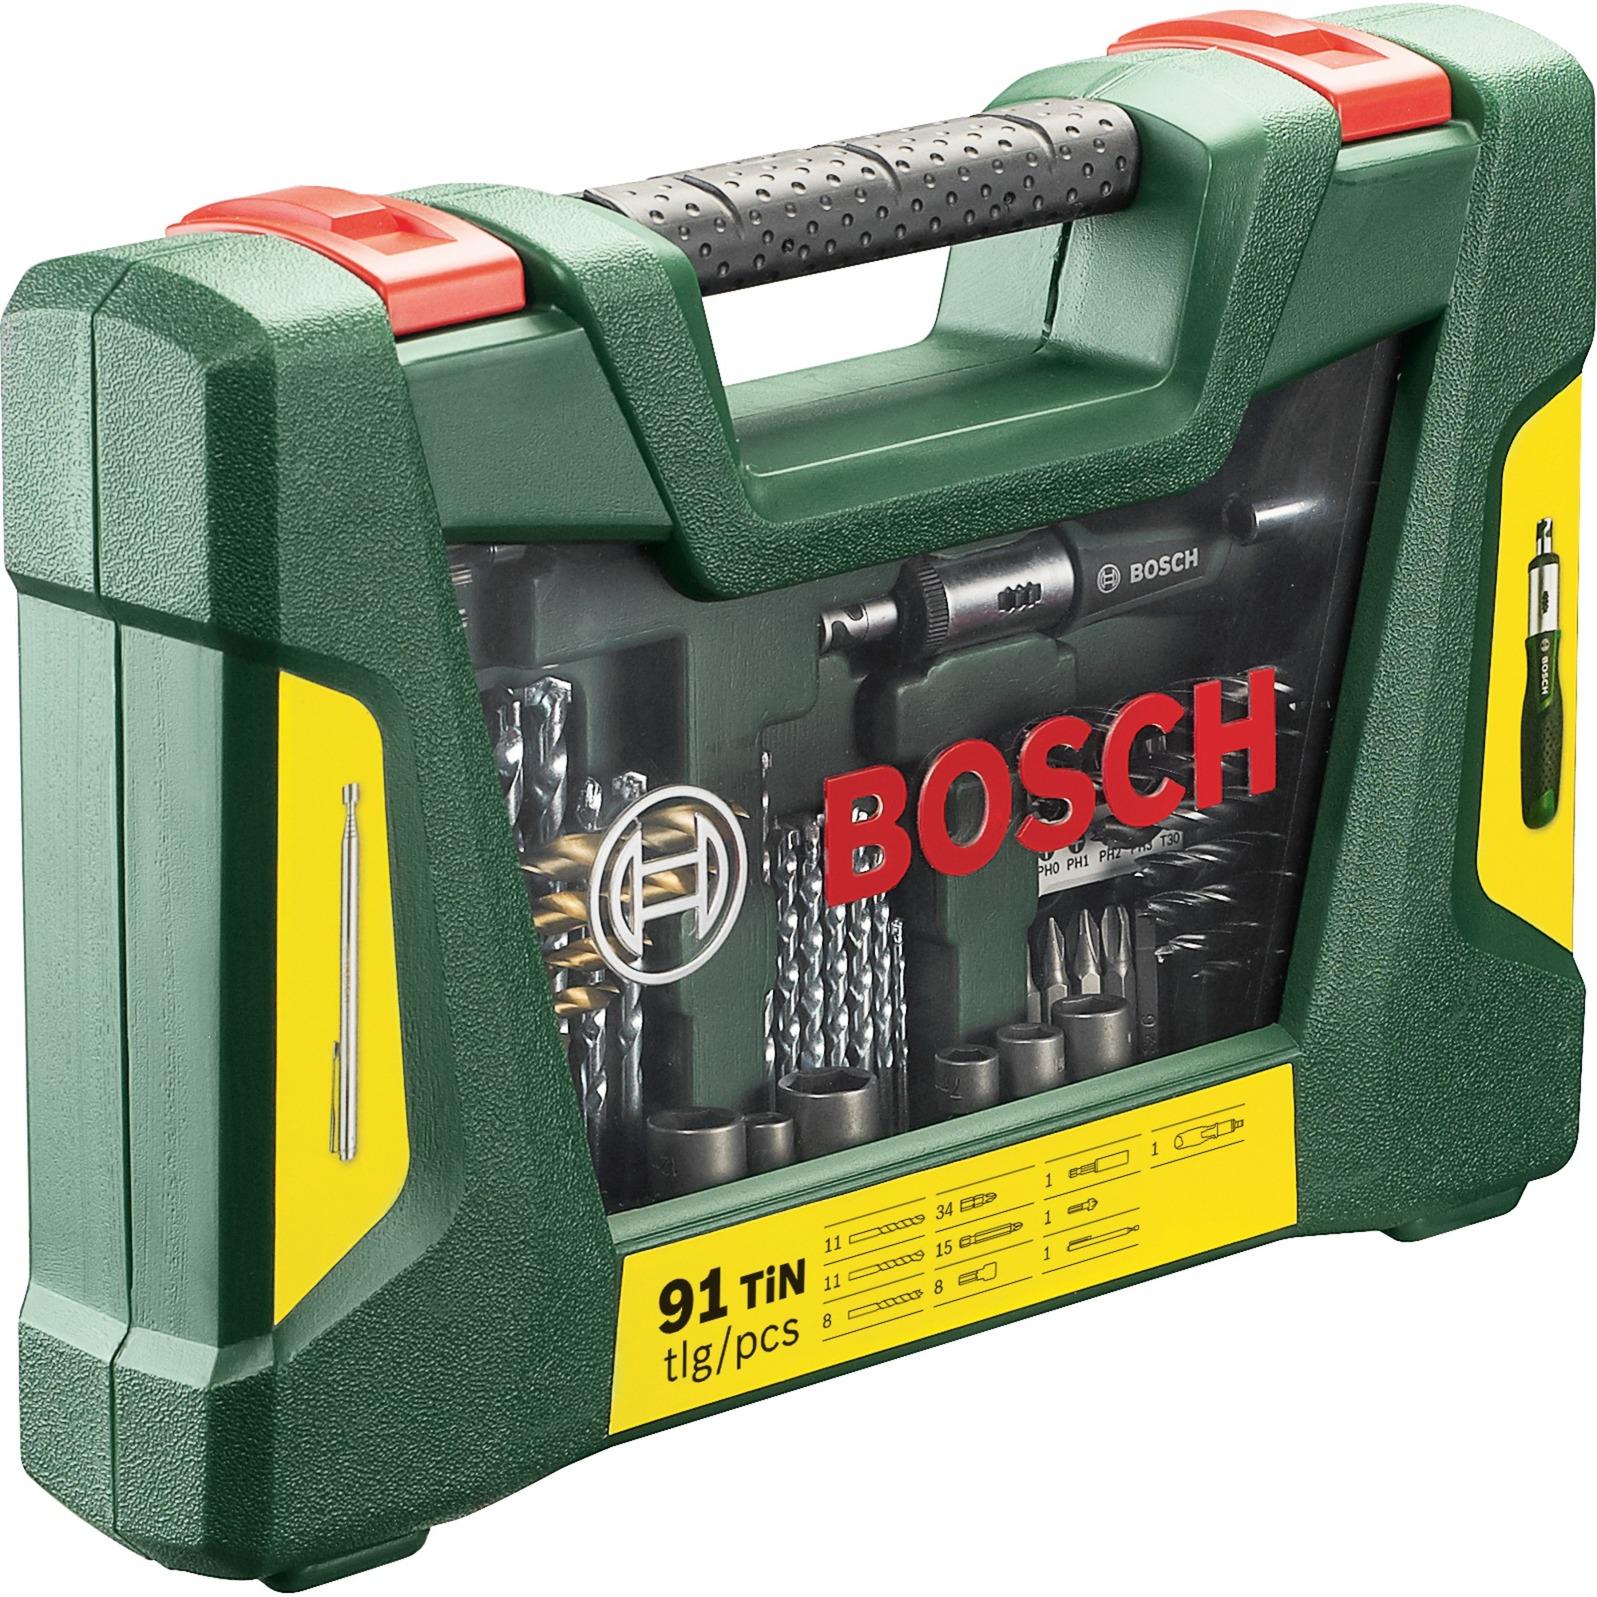 bosch v-line tin-bohrer- und bit-set, 91-teilig , bohrer- & bit-satz